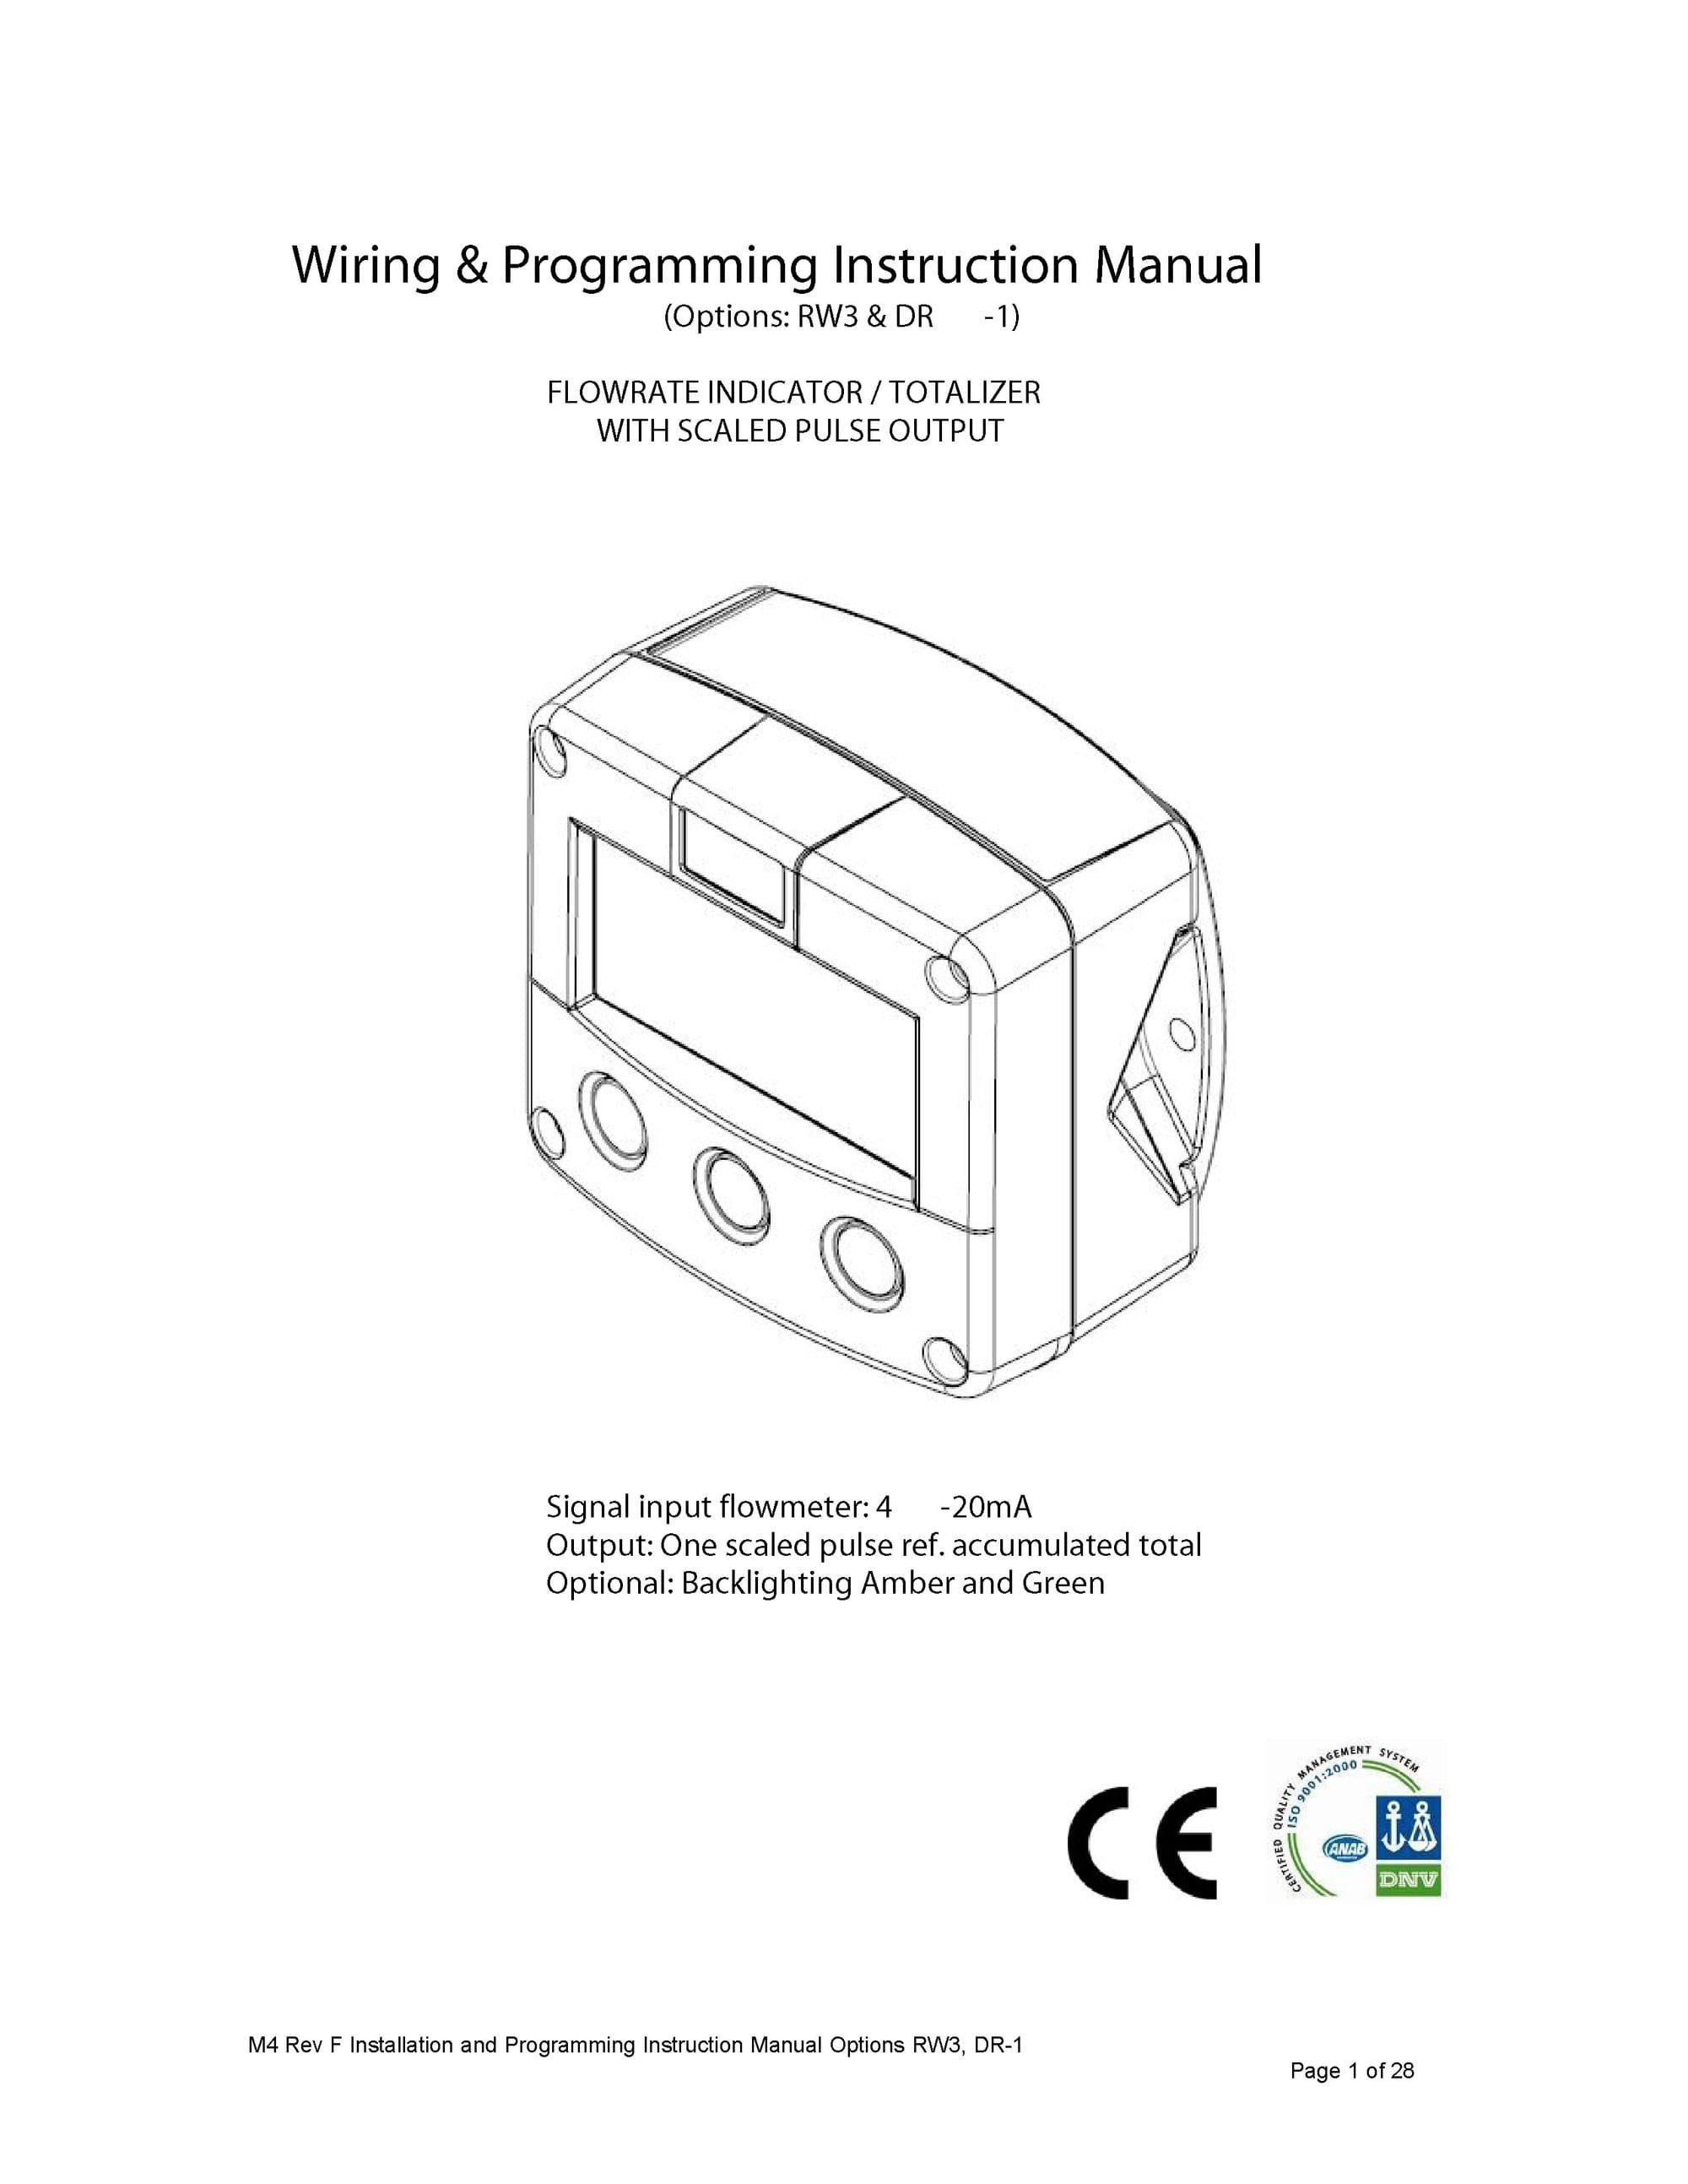 Digital Display Instruction Manual